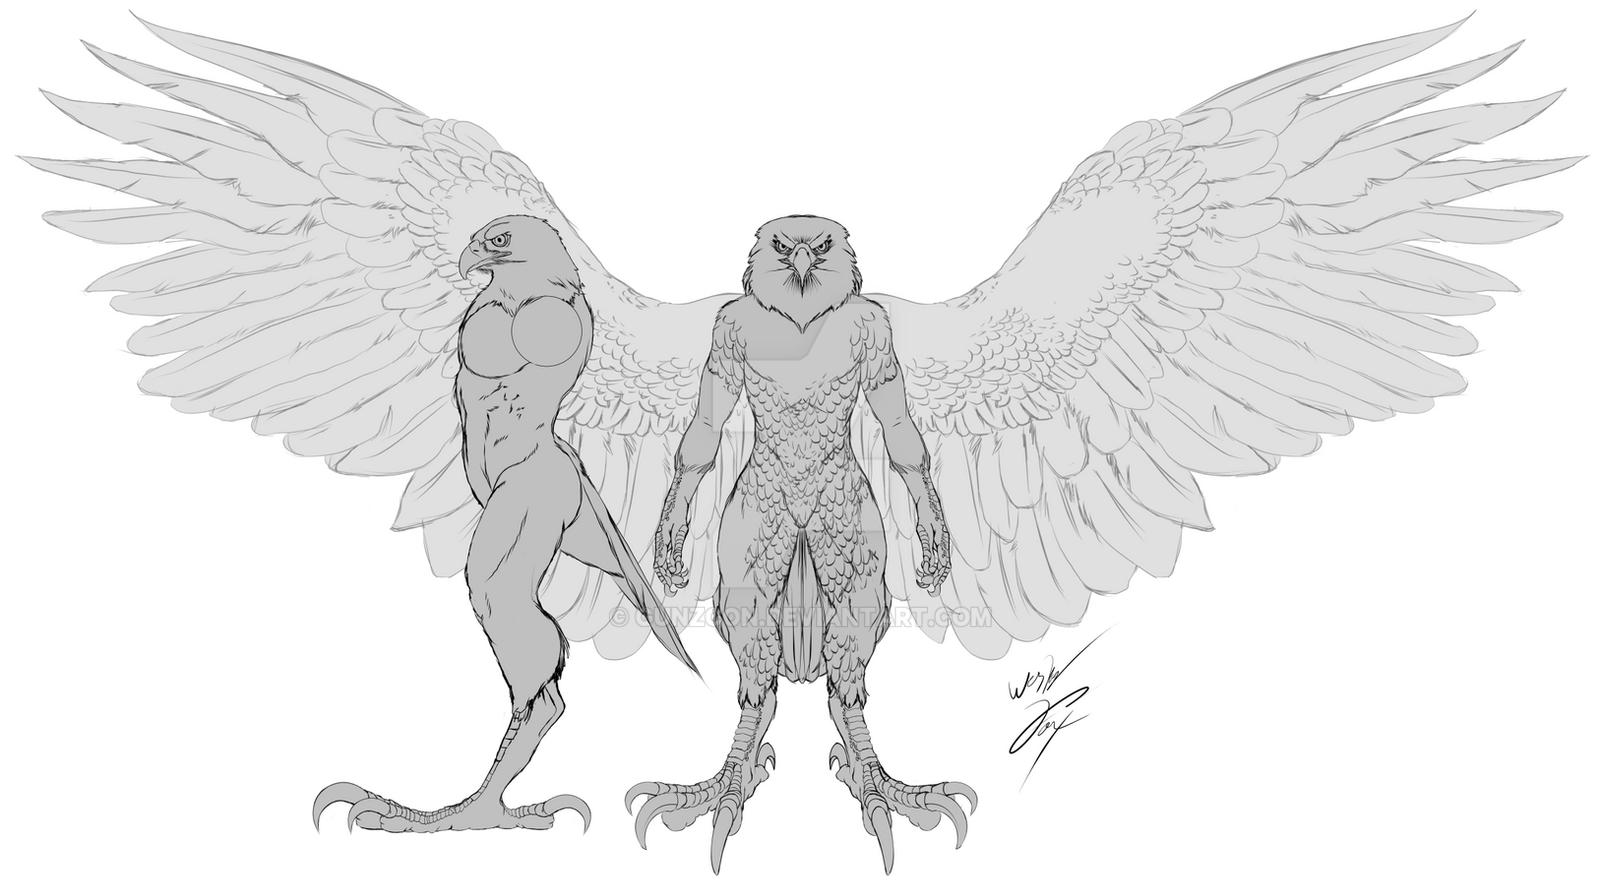 Bald eagle anatomy